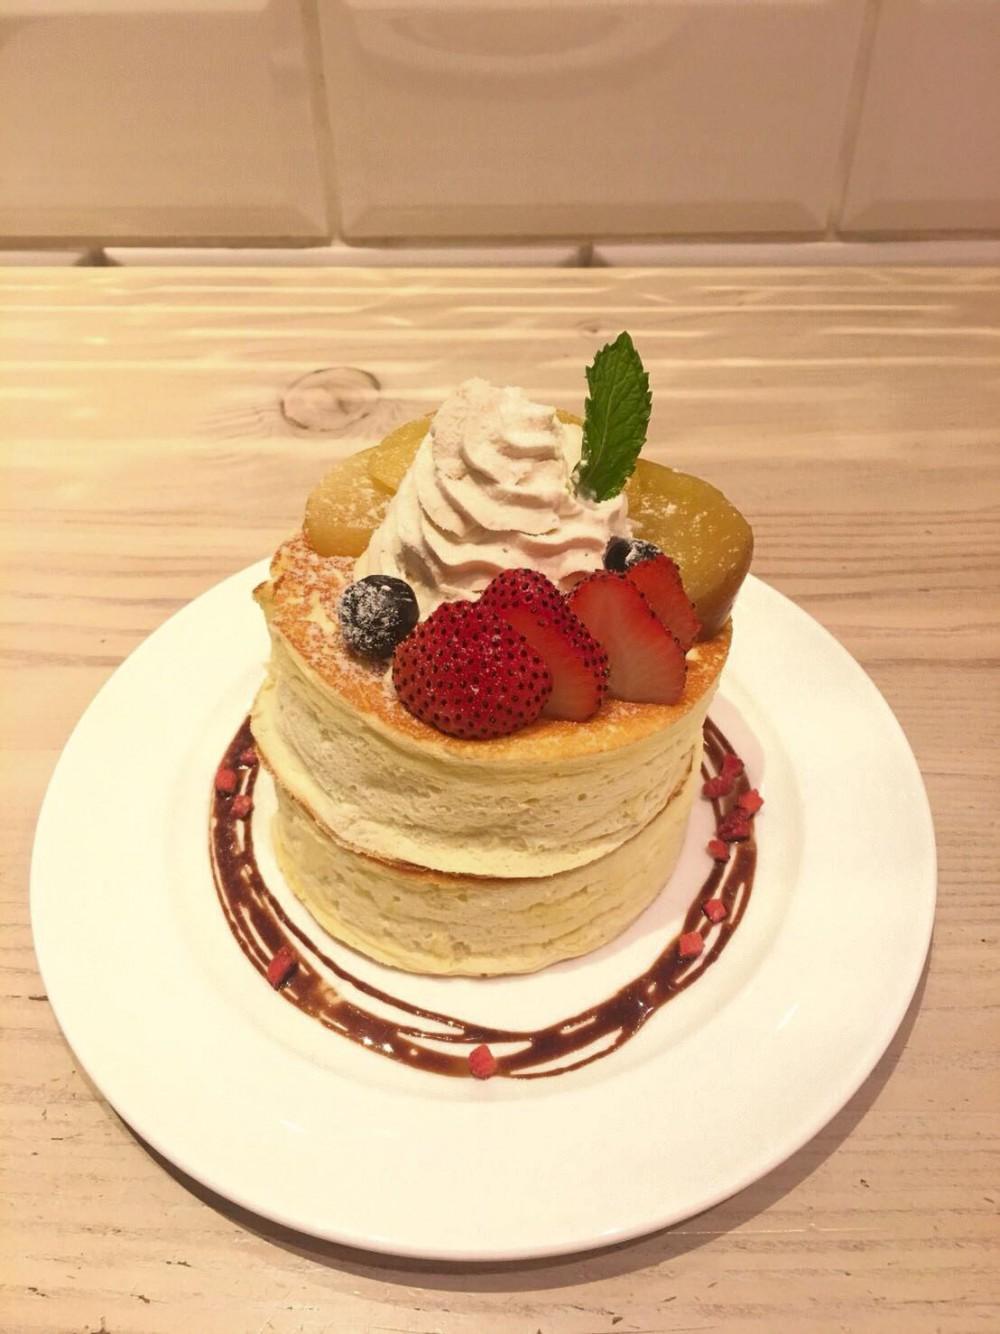 Letao 小樽洋菓子舖 中山店 Facebook專頁